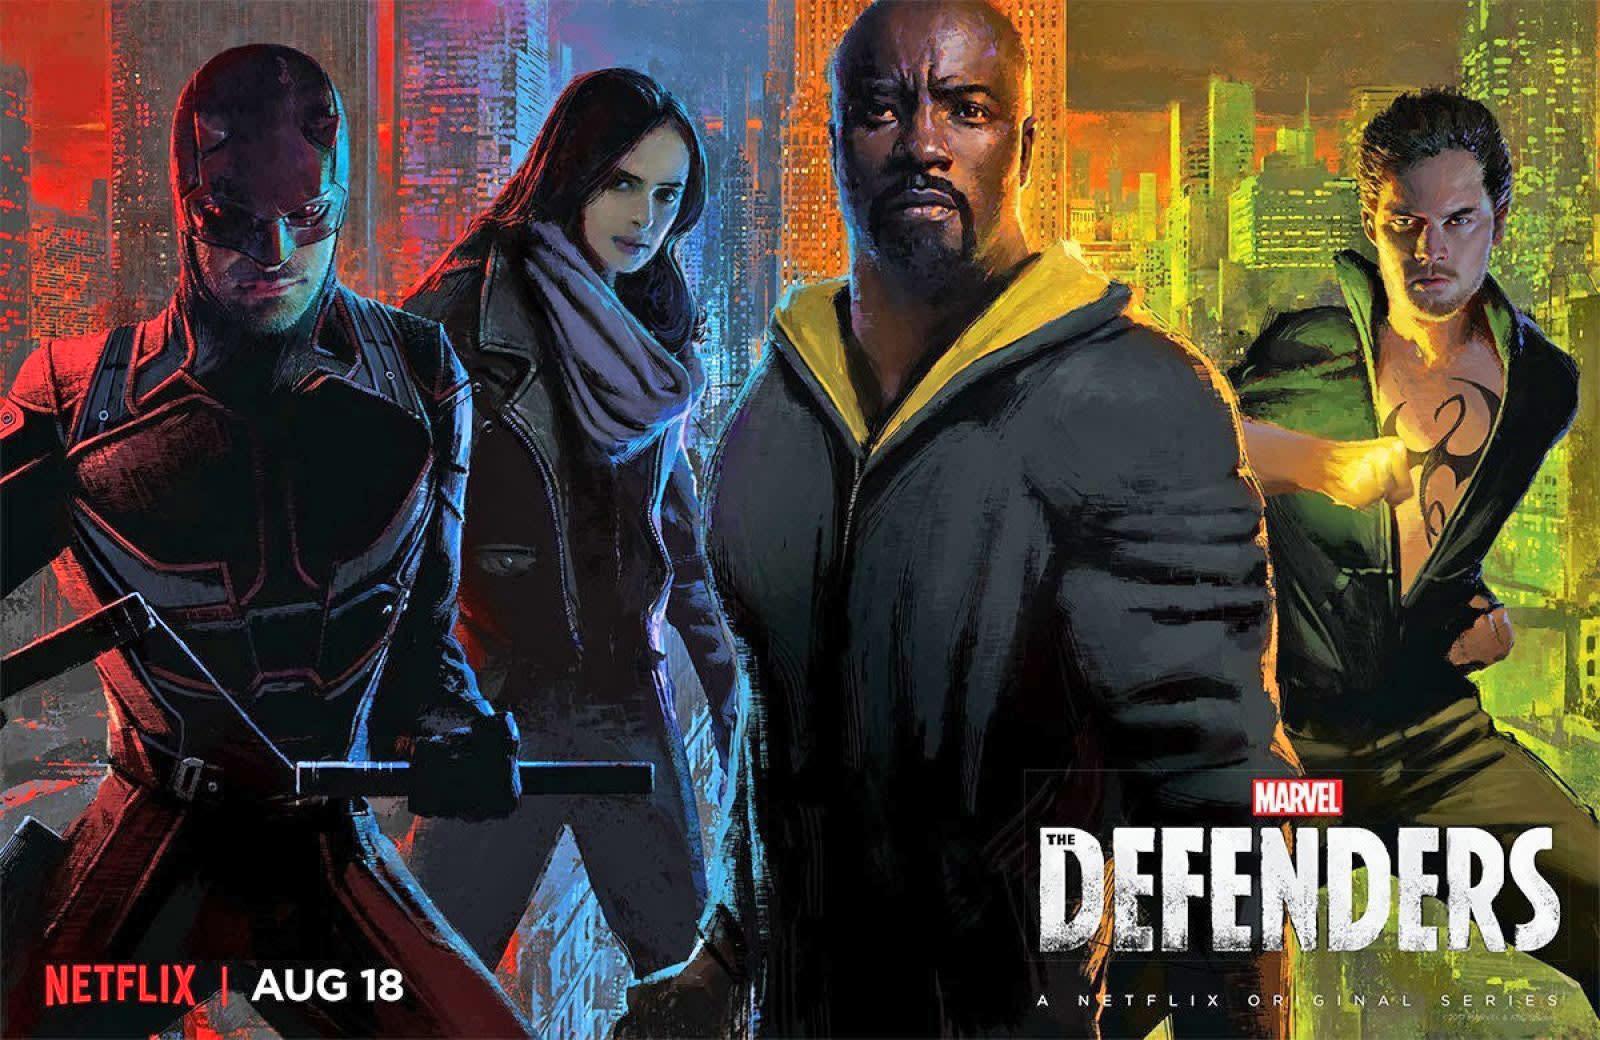 Marvel's Defenders probably won't return on TV until 2020 | Engadget